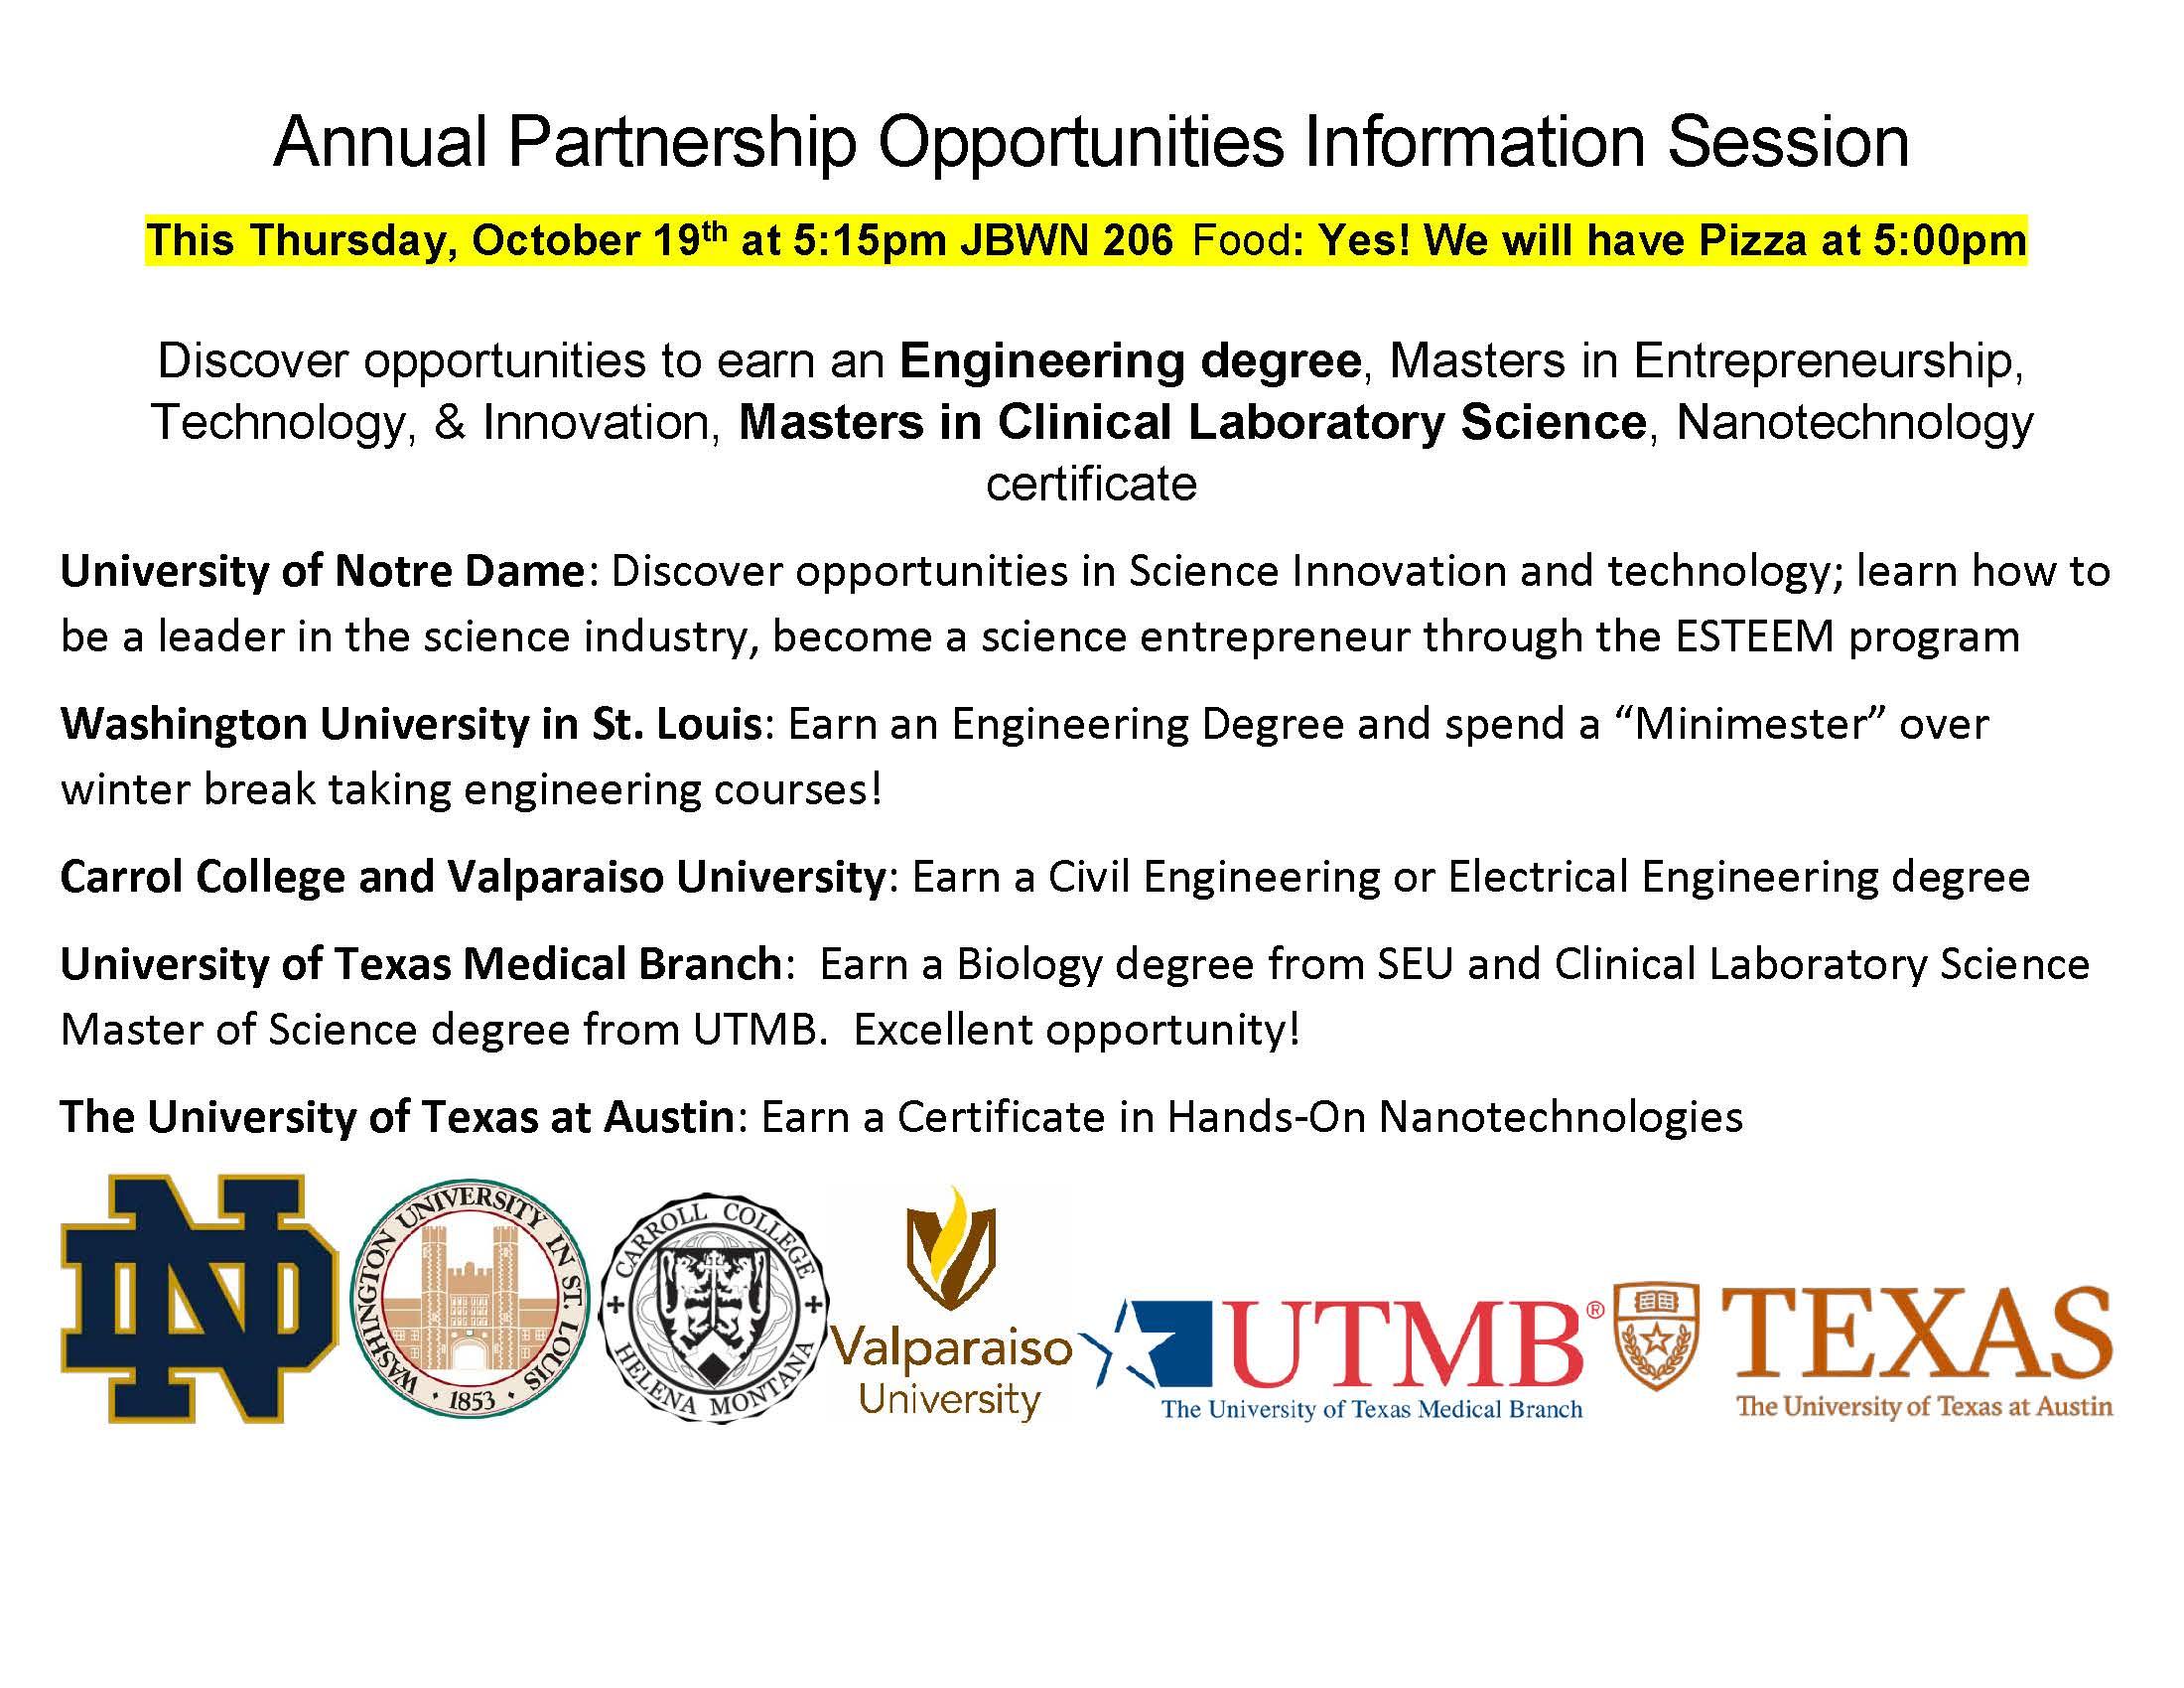 NSCI Partnerships Information Session: JBWN 206 @ 5:15 | NSCI News